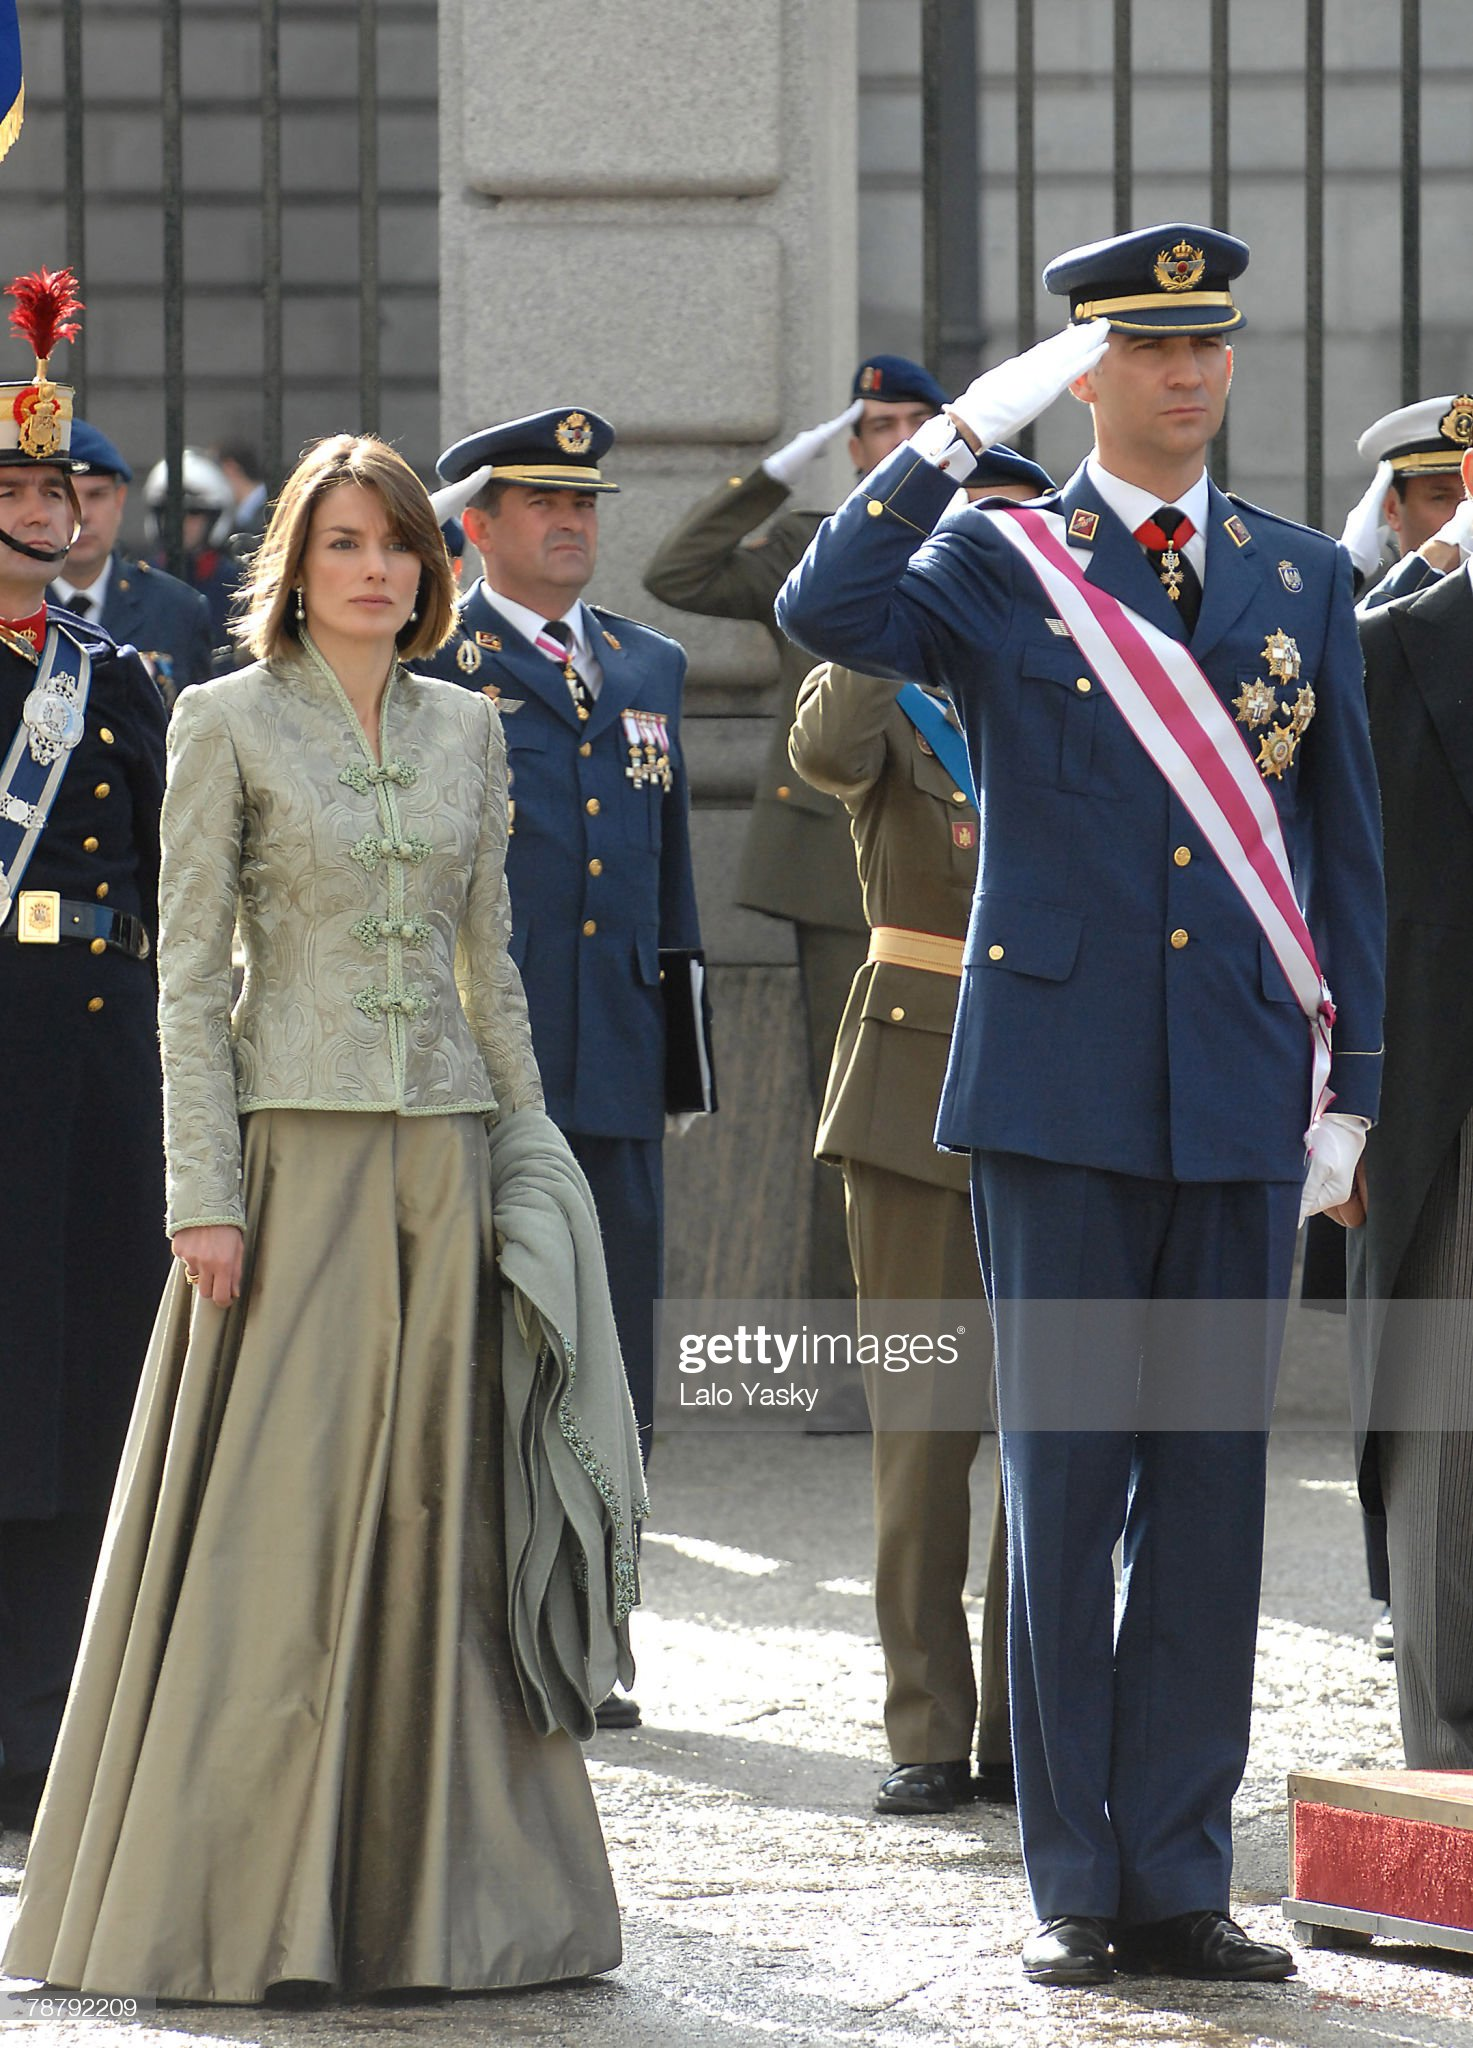 Вечерние наряды Королевы Летиции Spanish Royals Host New Year Military Reception : News Photo